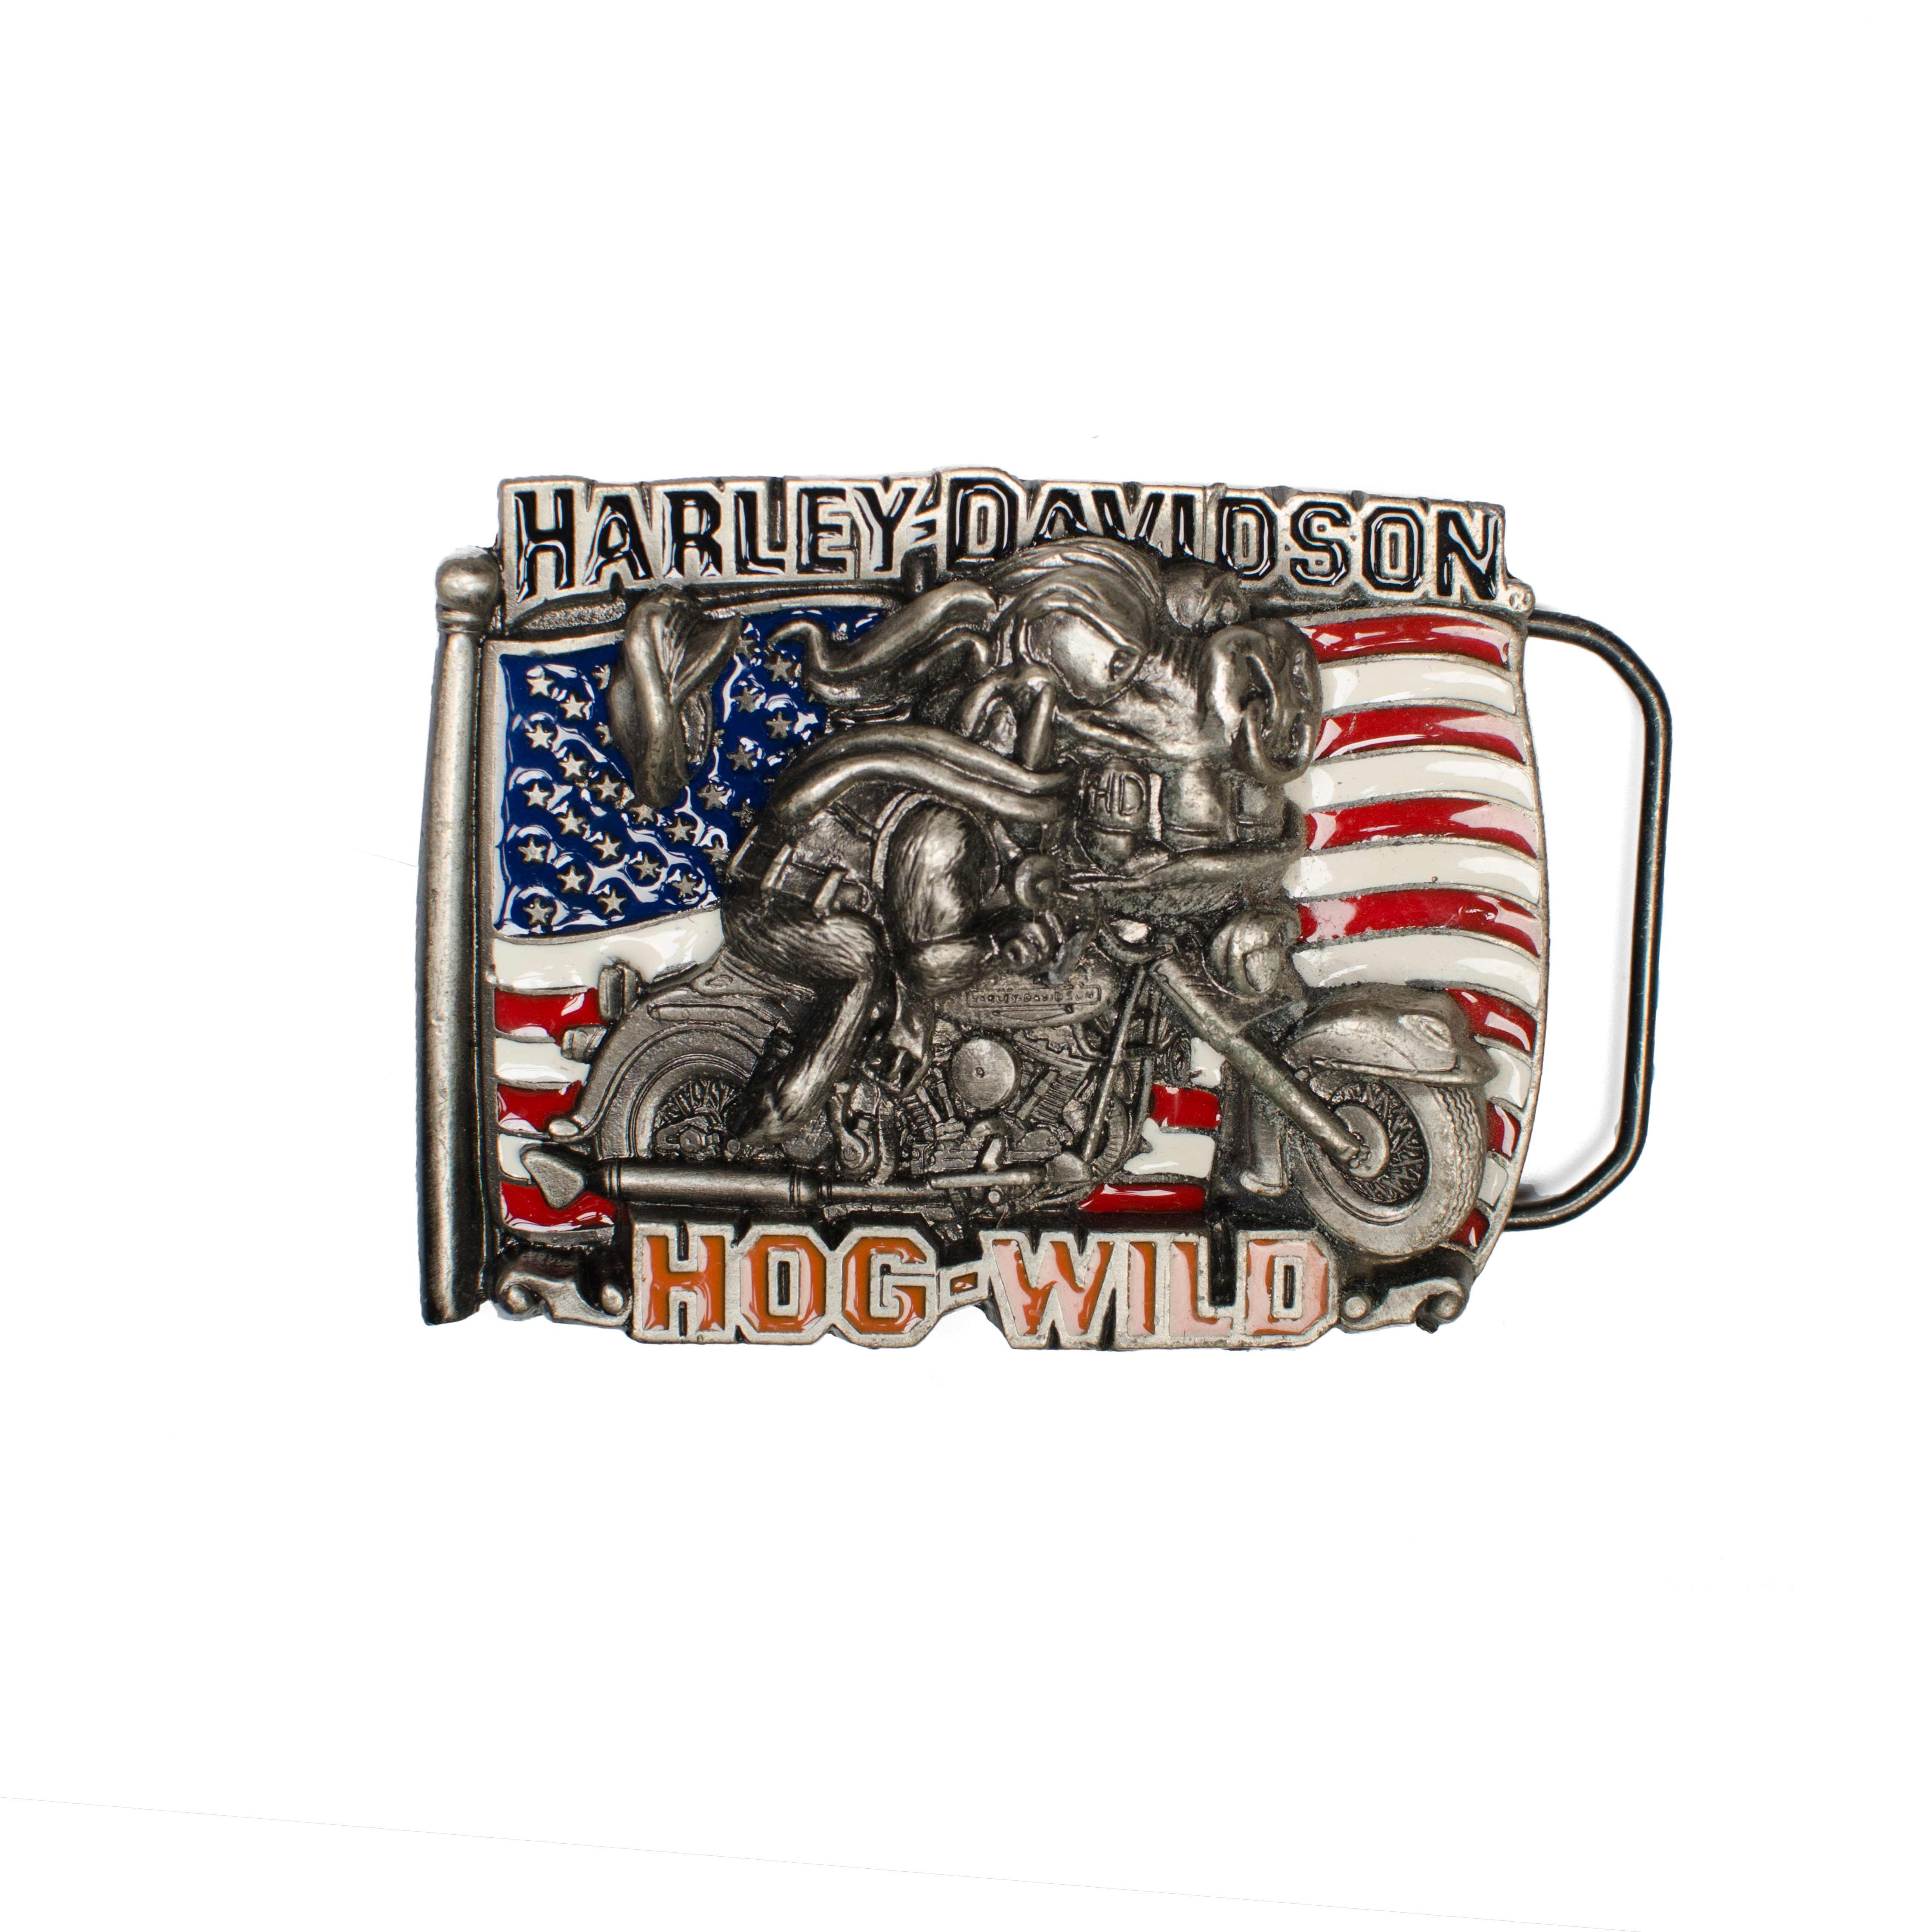 Harley Davidson Hog Wild Buckle H426